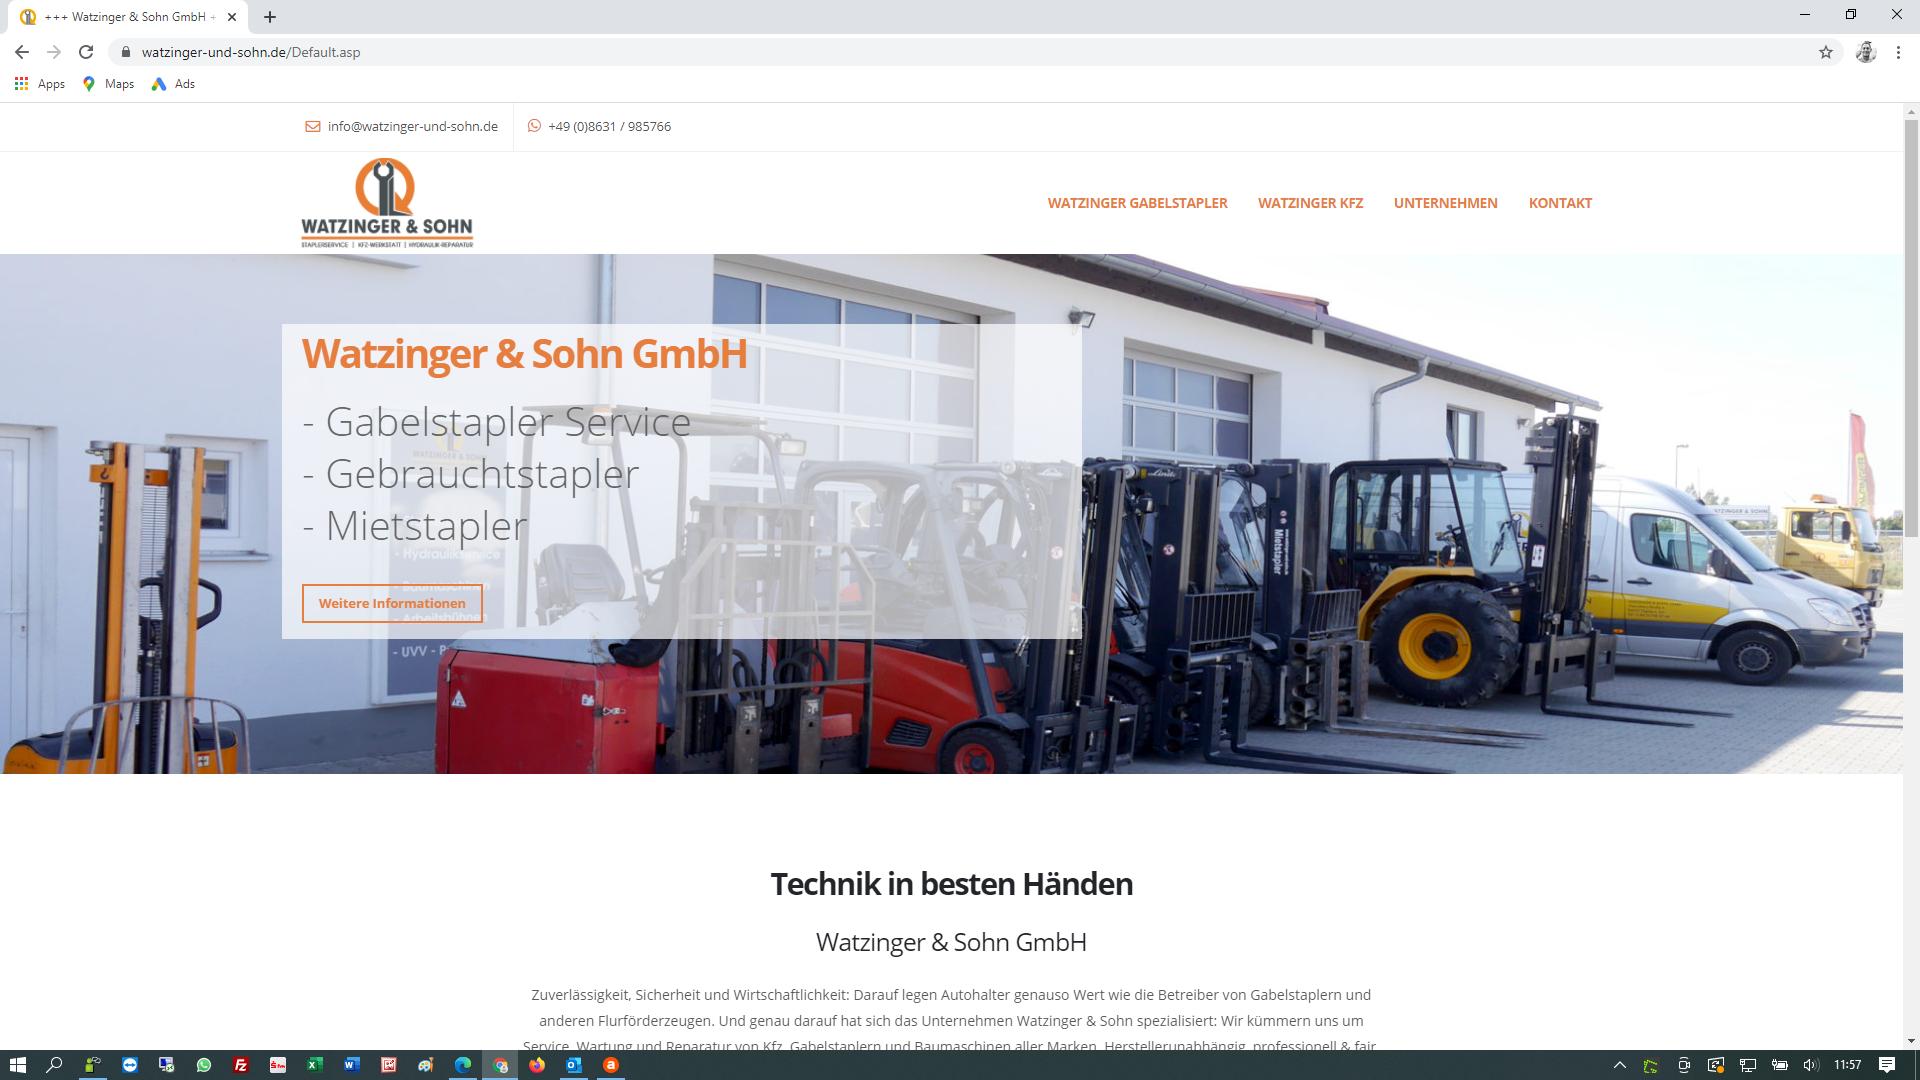 Watzinger & Sohn GmbH